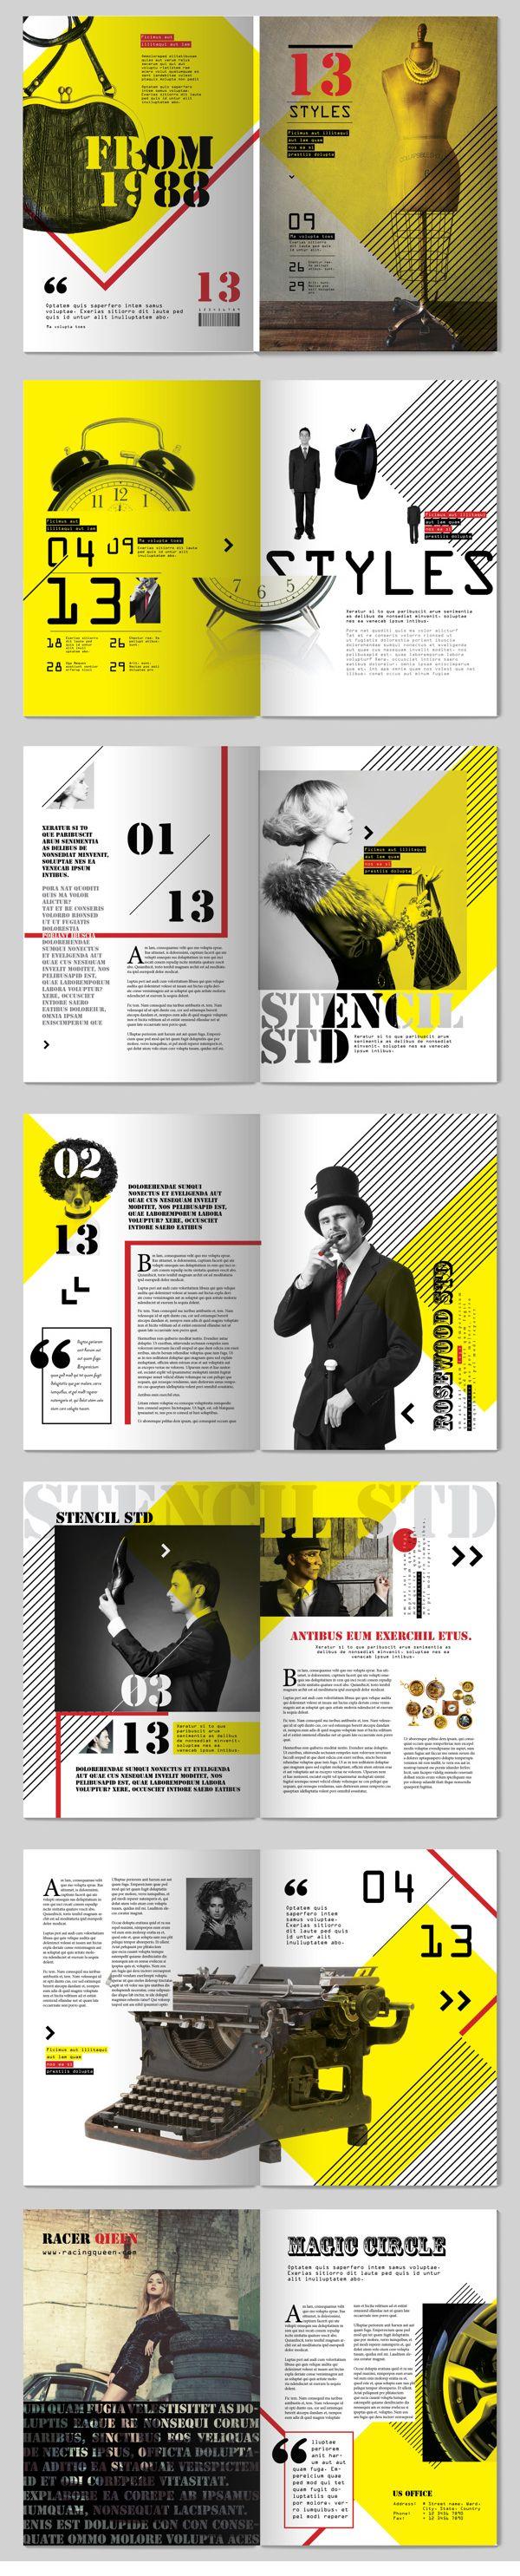 Eye-catchy Brochure Design Samples | LogoPeople India